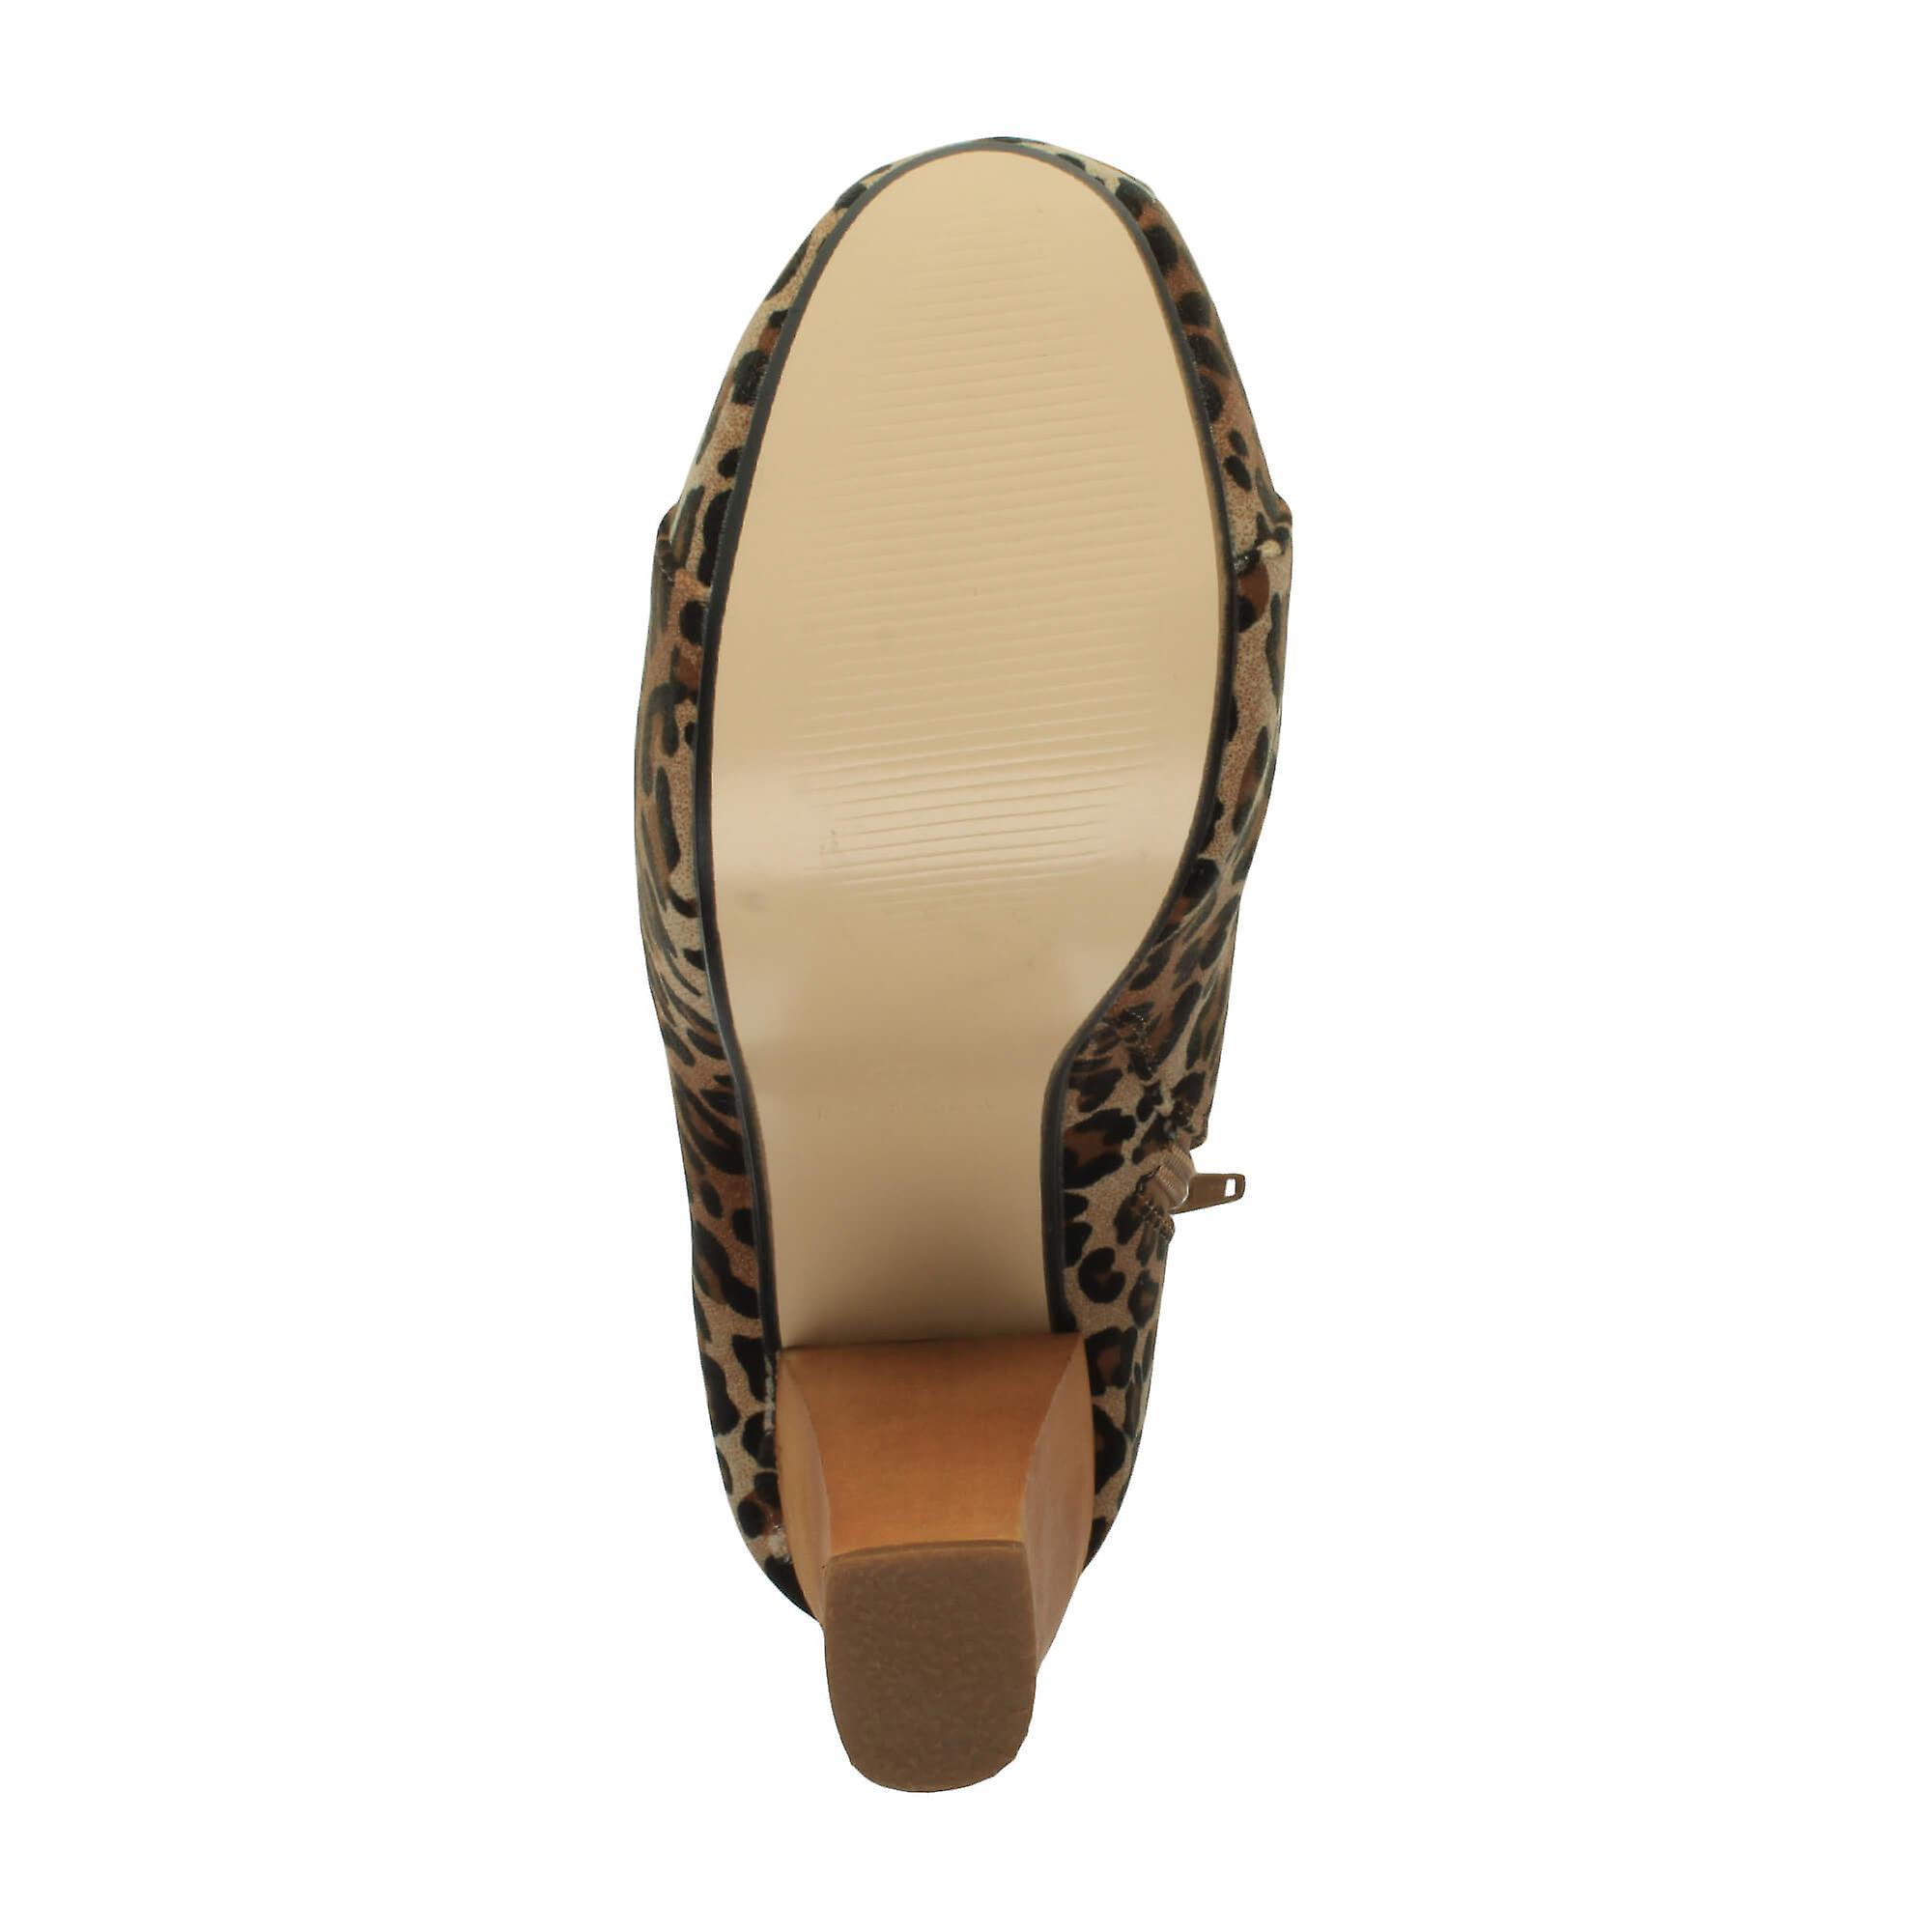 48893cba1b0 Ajvani womens lace up platform wooden block high heel booties ankle boots